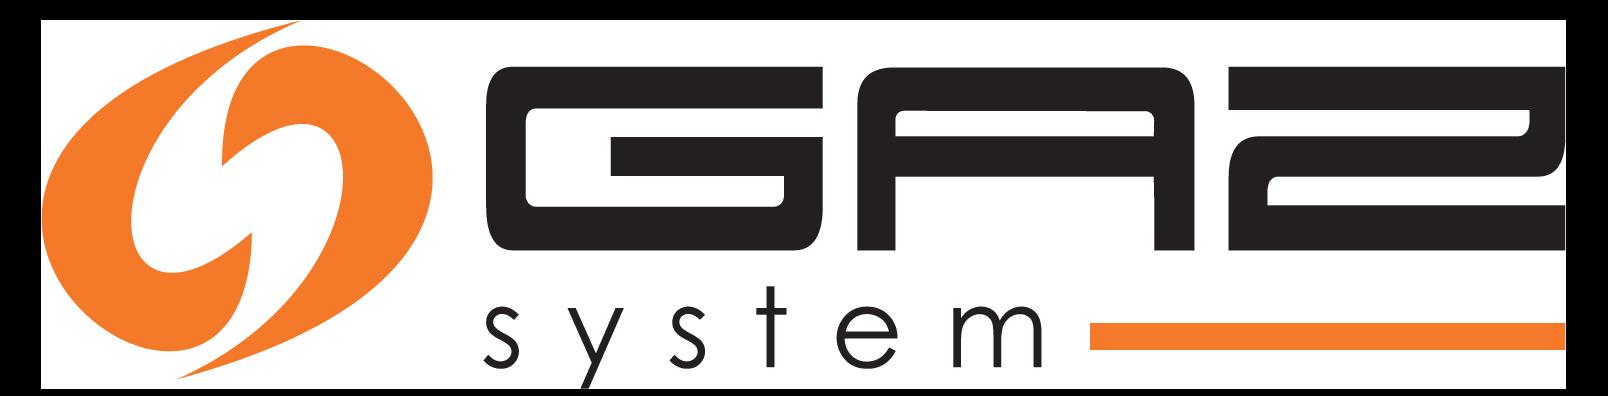 Gaz System S.A. :